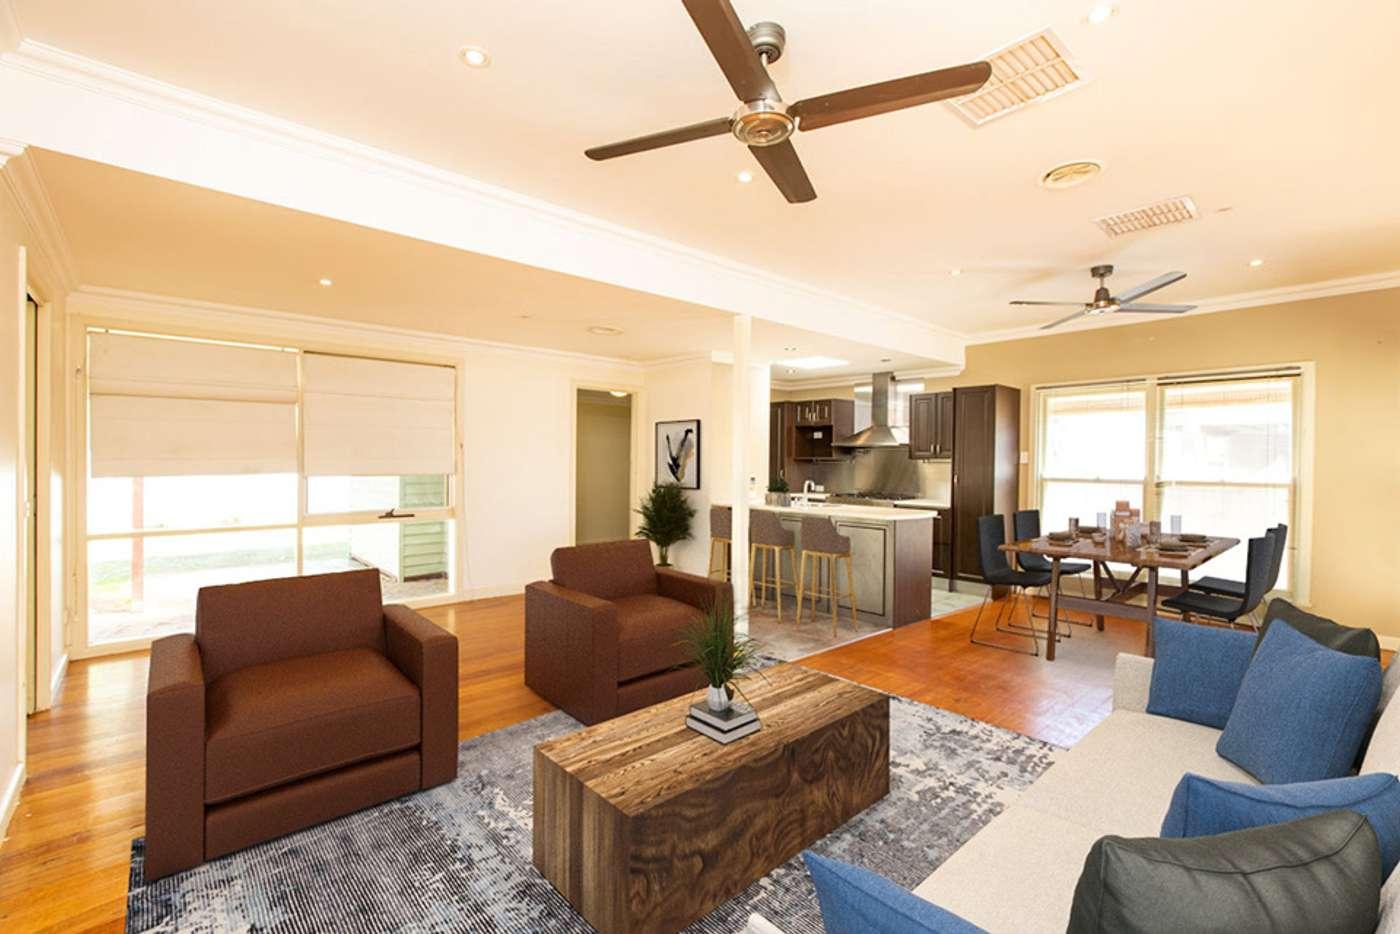 Main view of Homely house listing, 279 Eleventh Street, Mildura VIC 3500